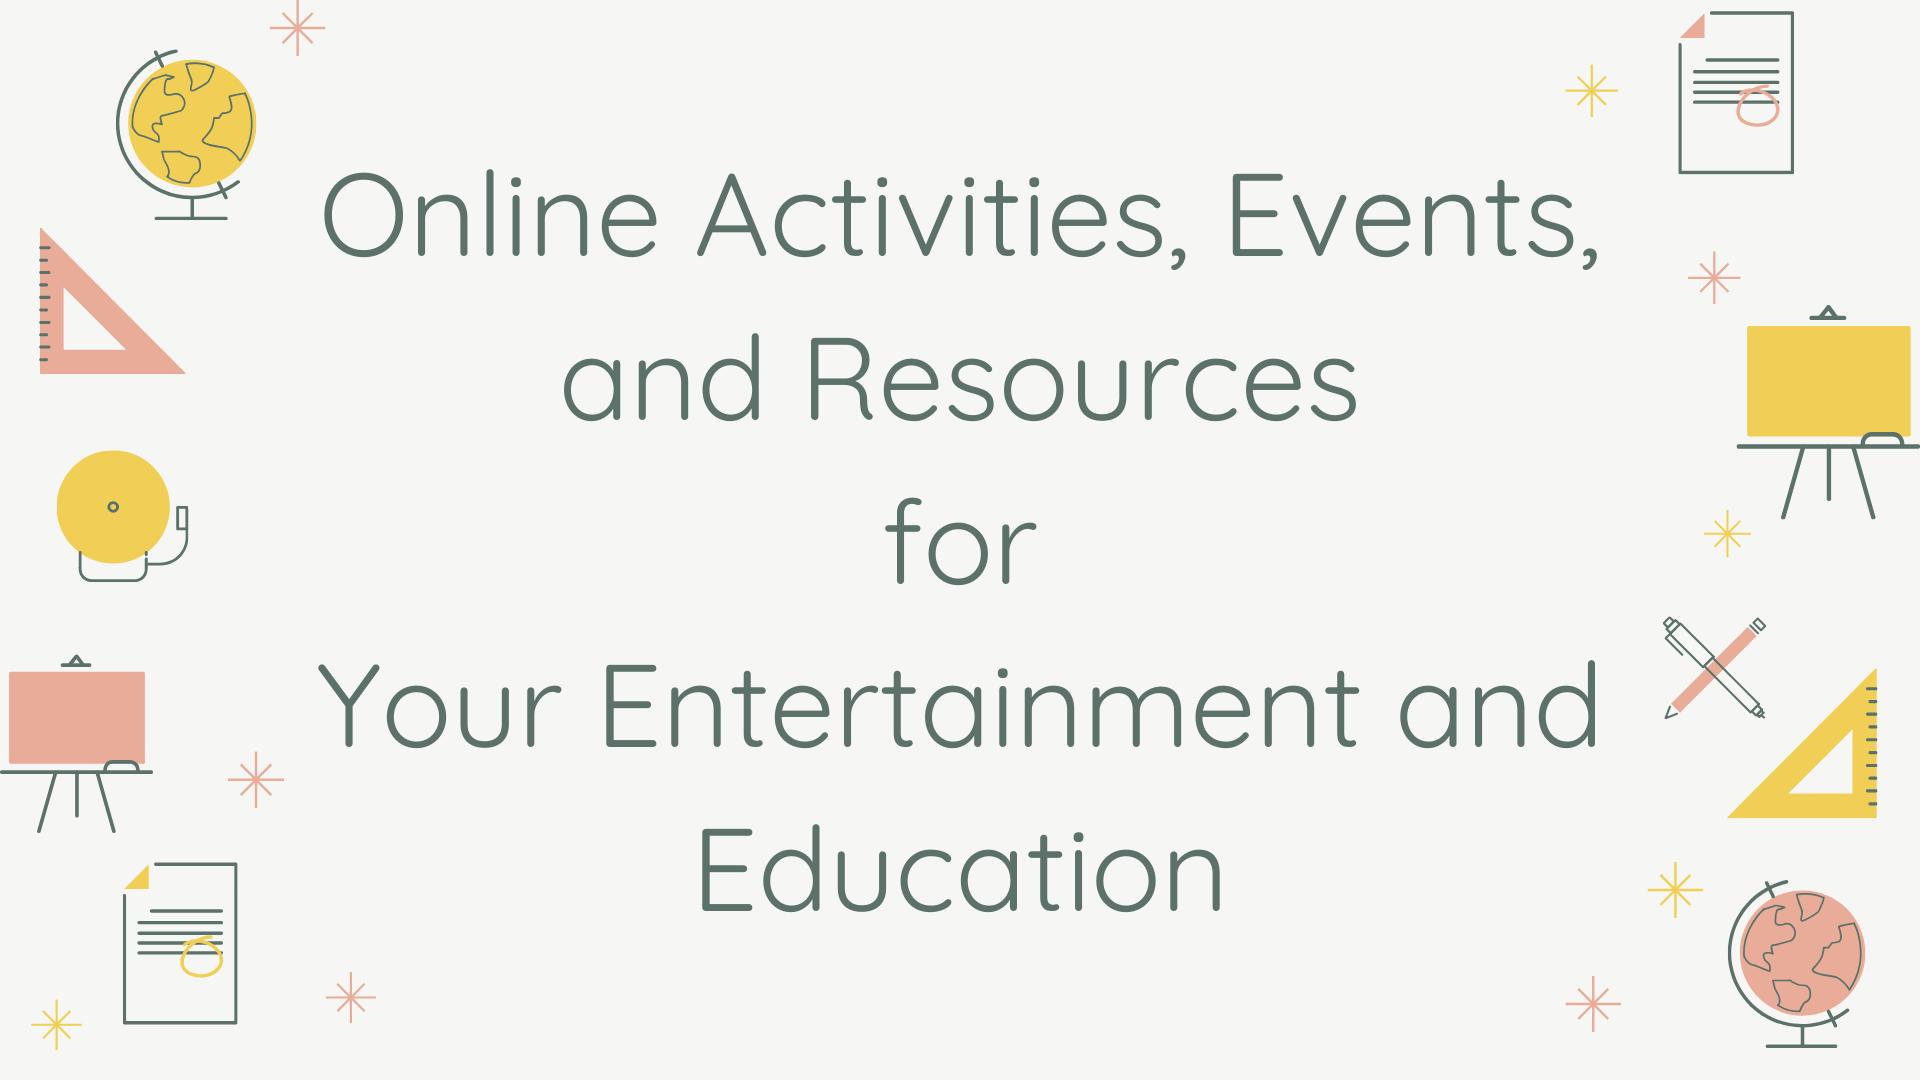 Online Activities, Events, and Resources